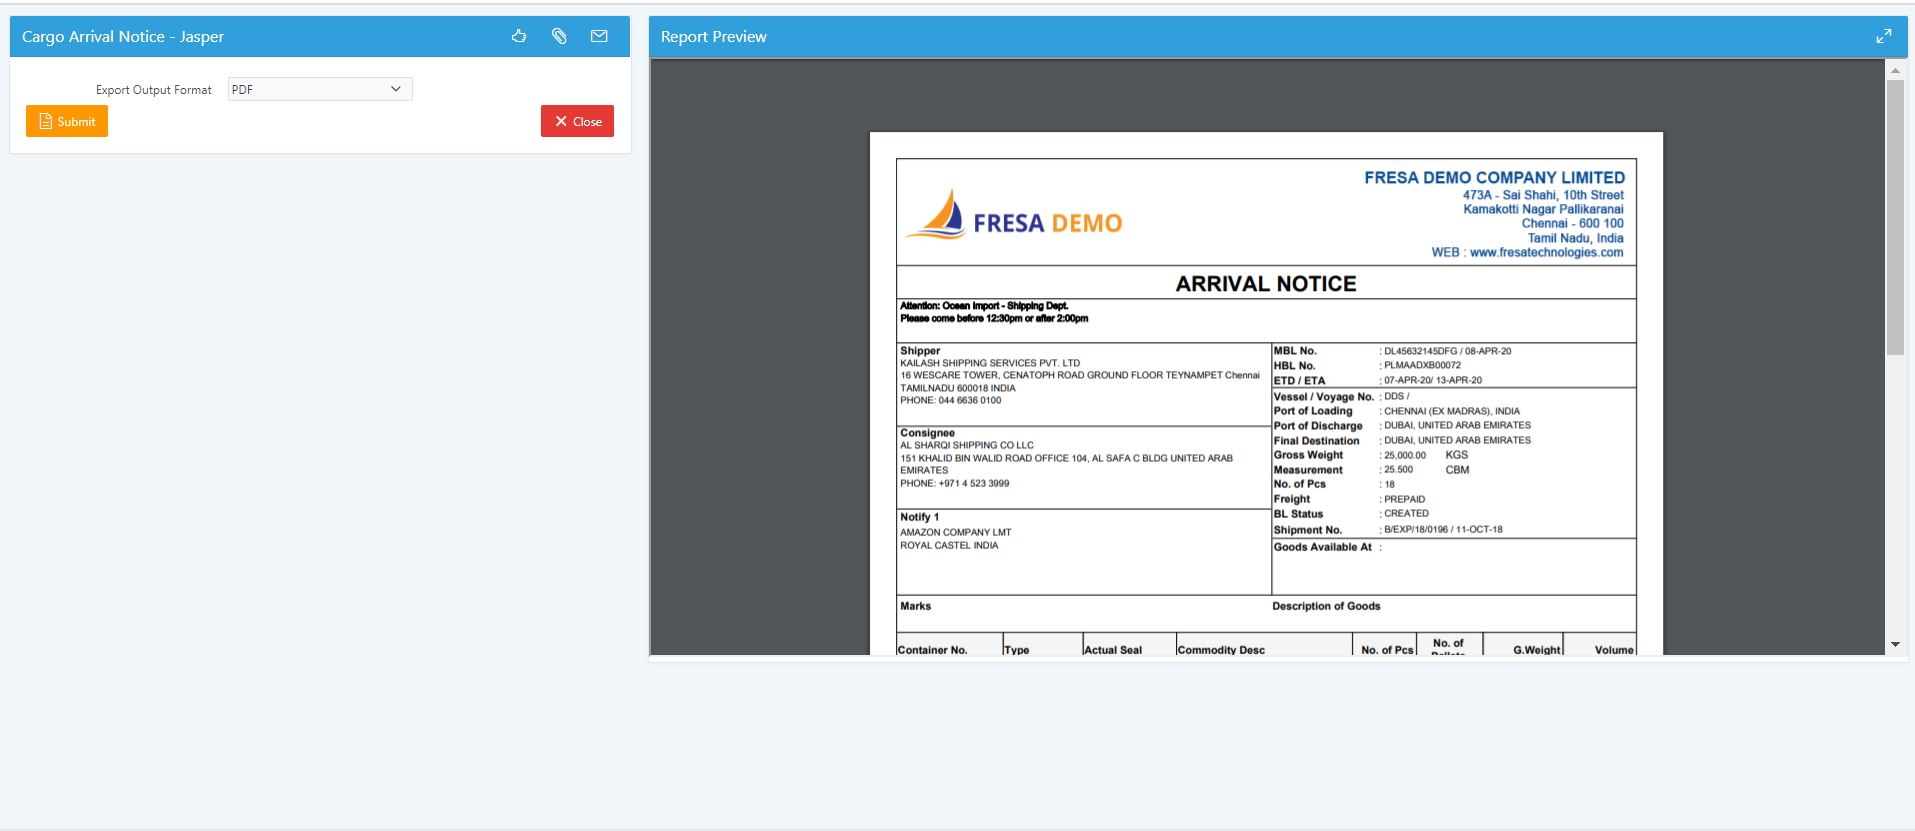 Cargo arrival notice